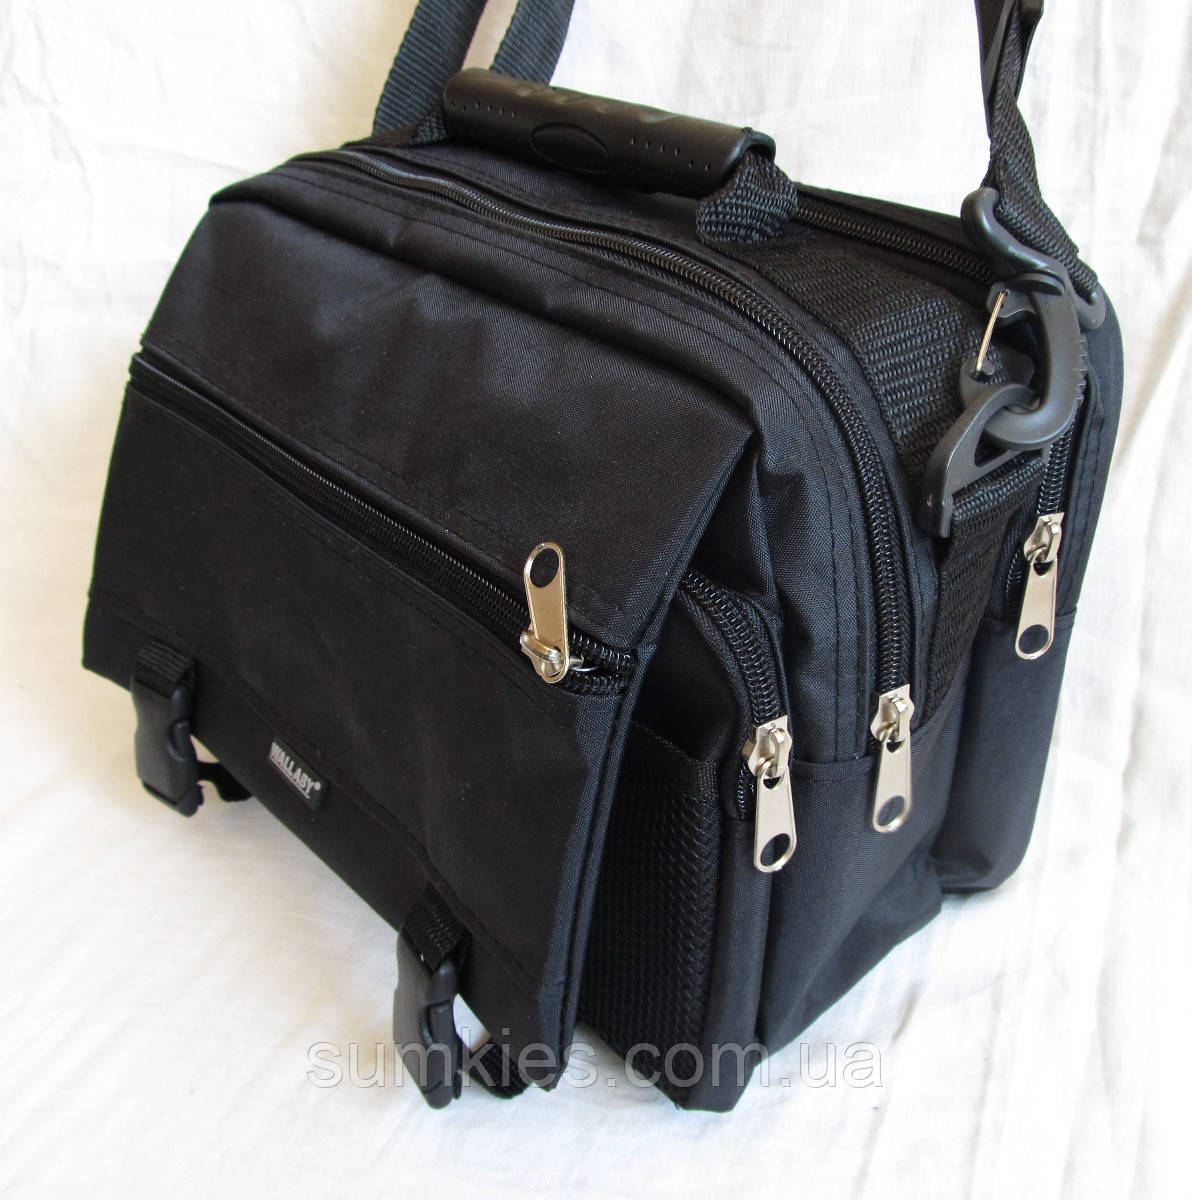 f8b012d334d8 Мужская сумка Wallaby2425 черная барсетка через плечо 28х21х16см ...